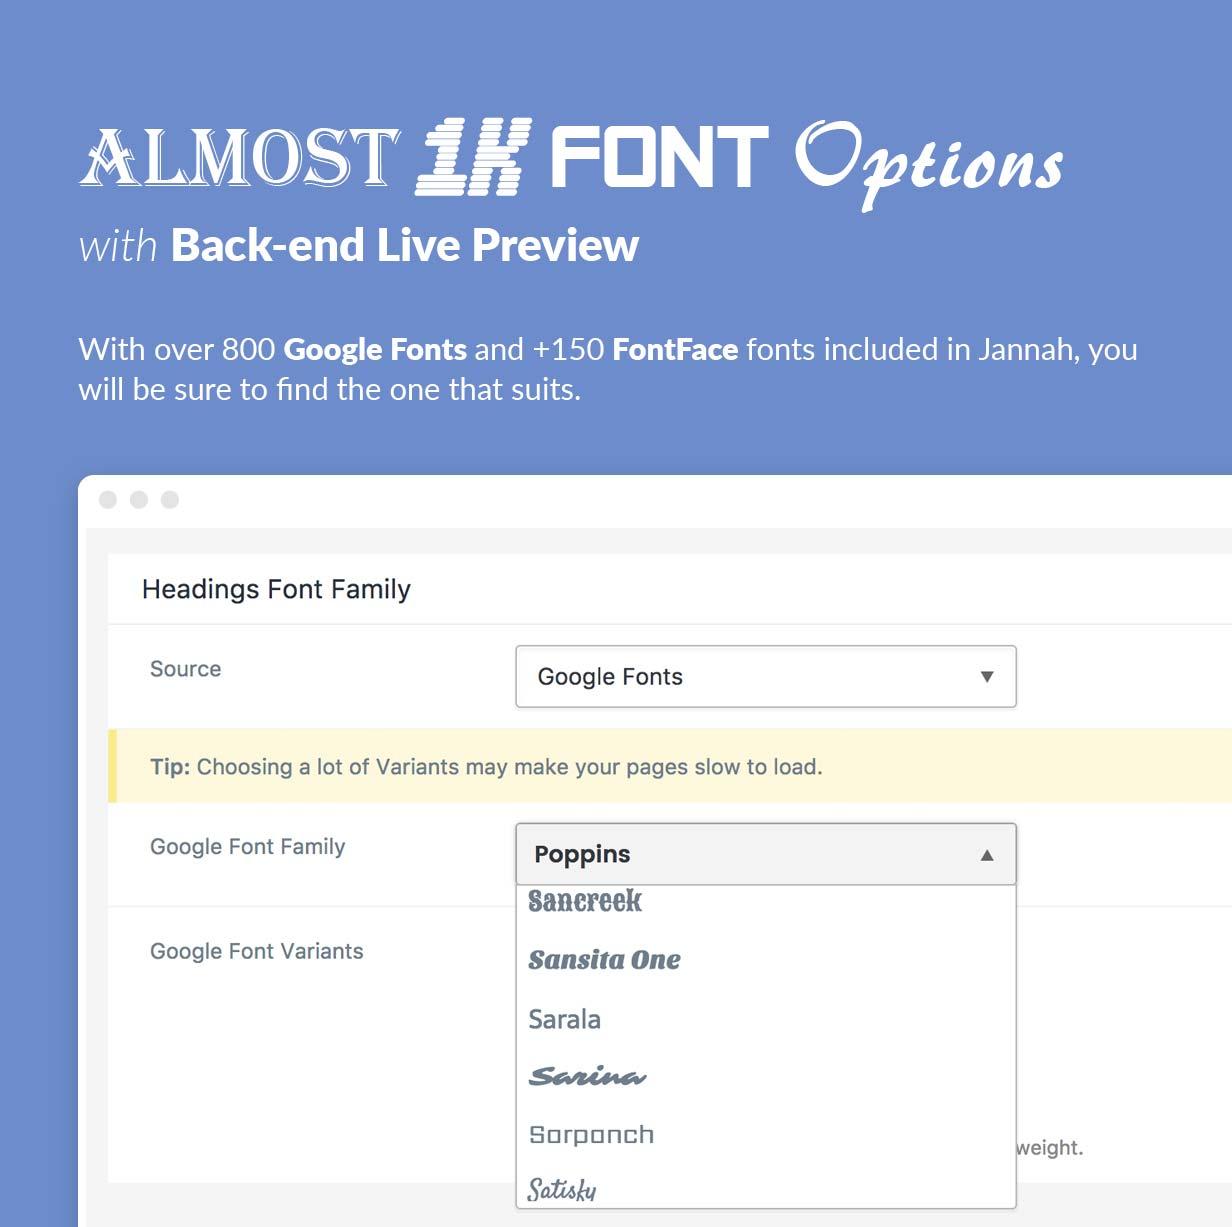 800 Google Fonts and +150 FontFace fonts